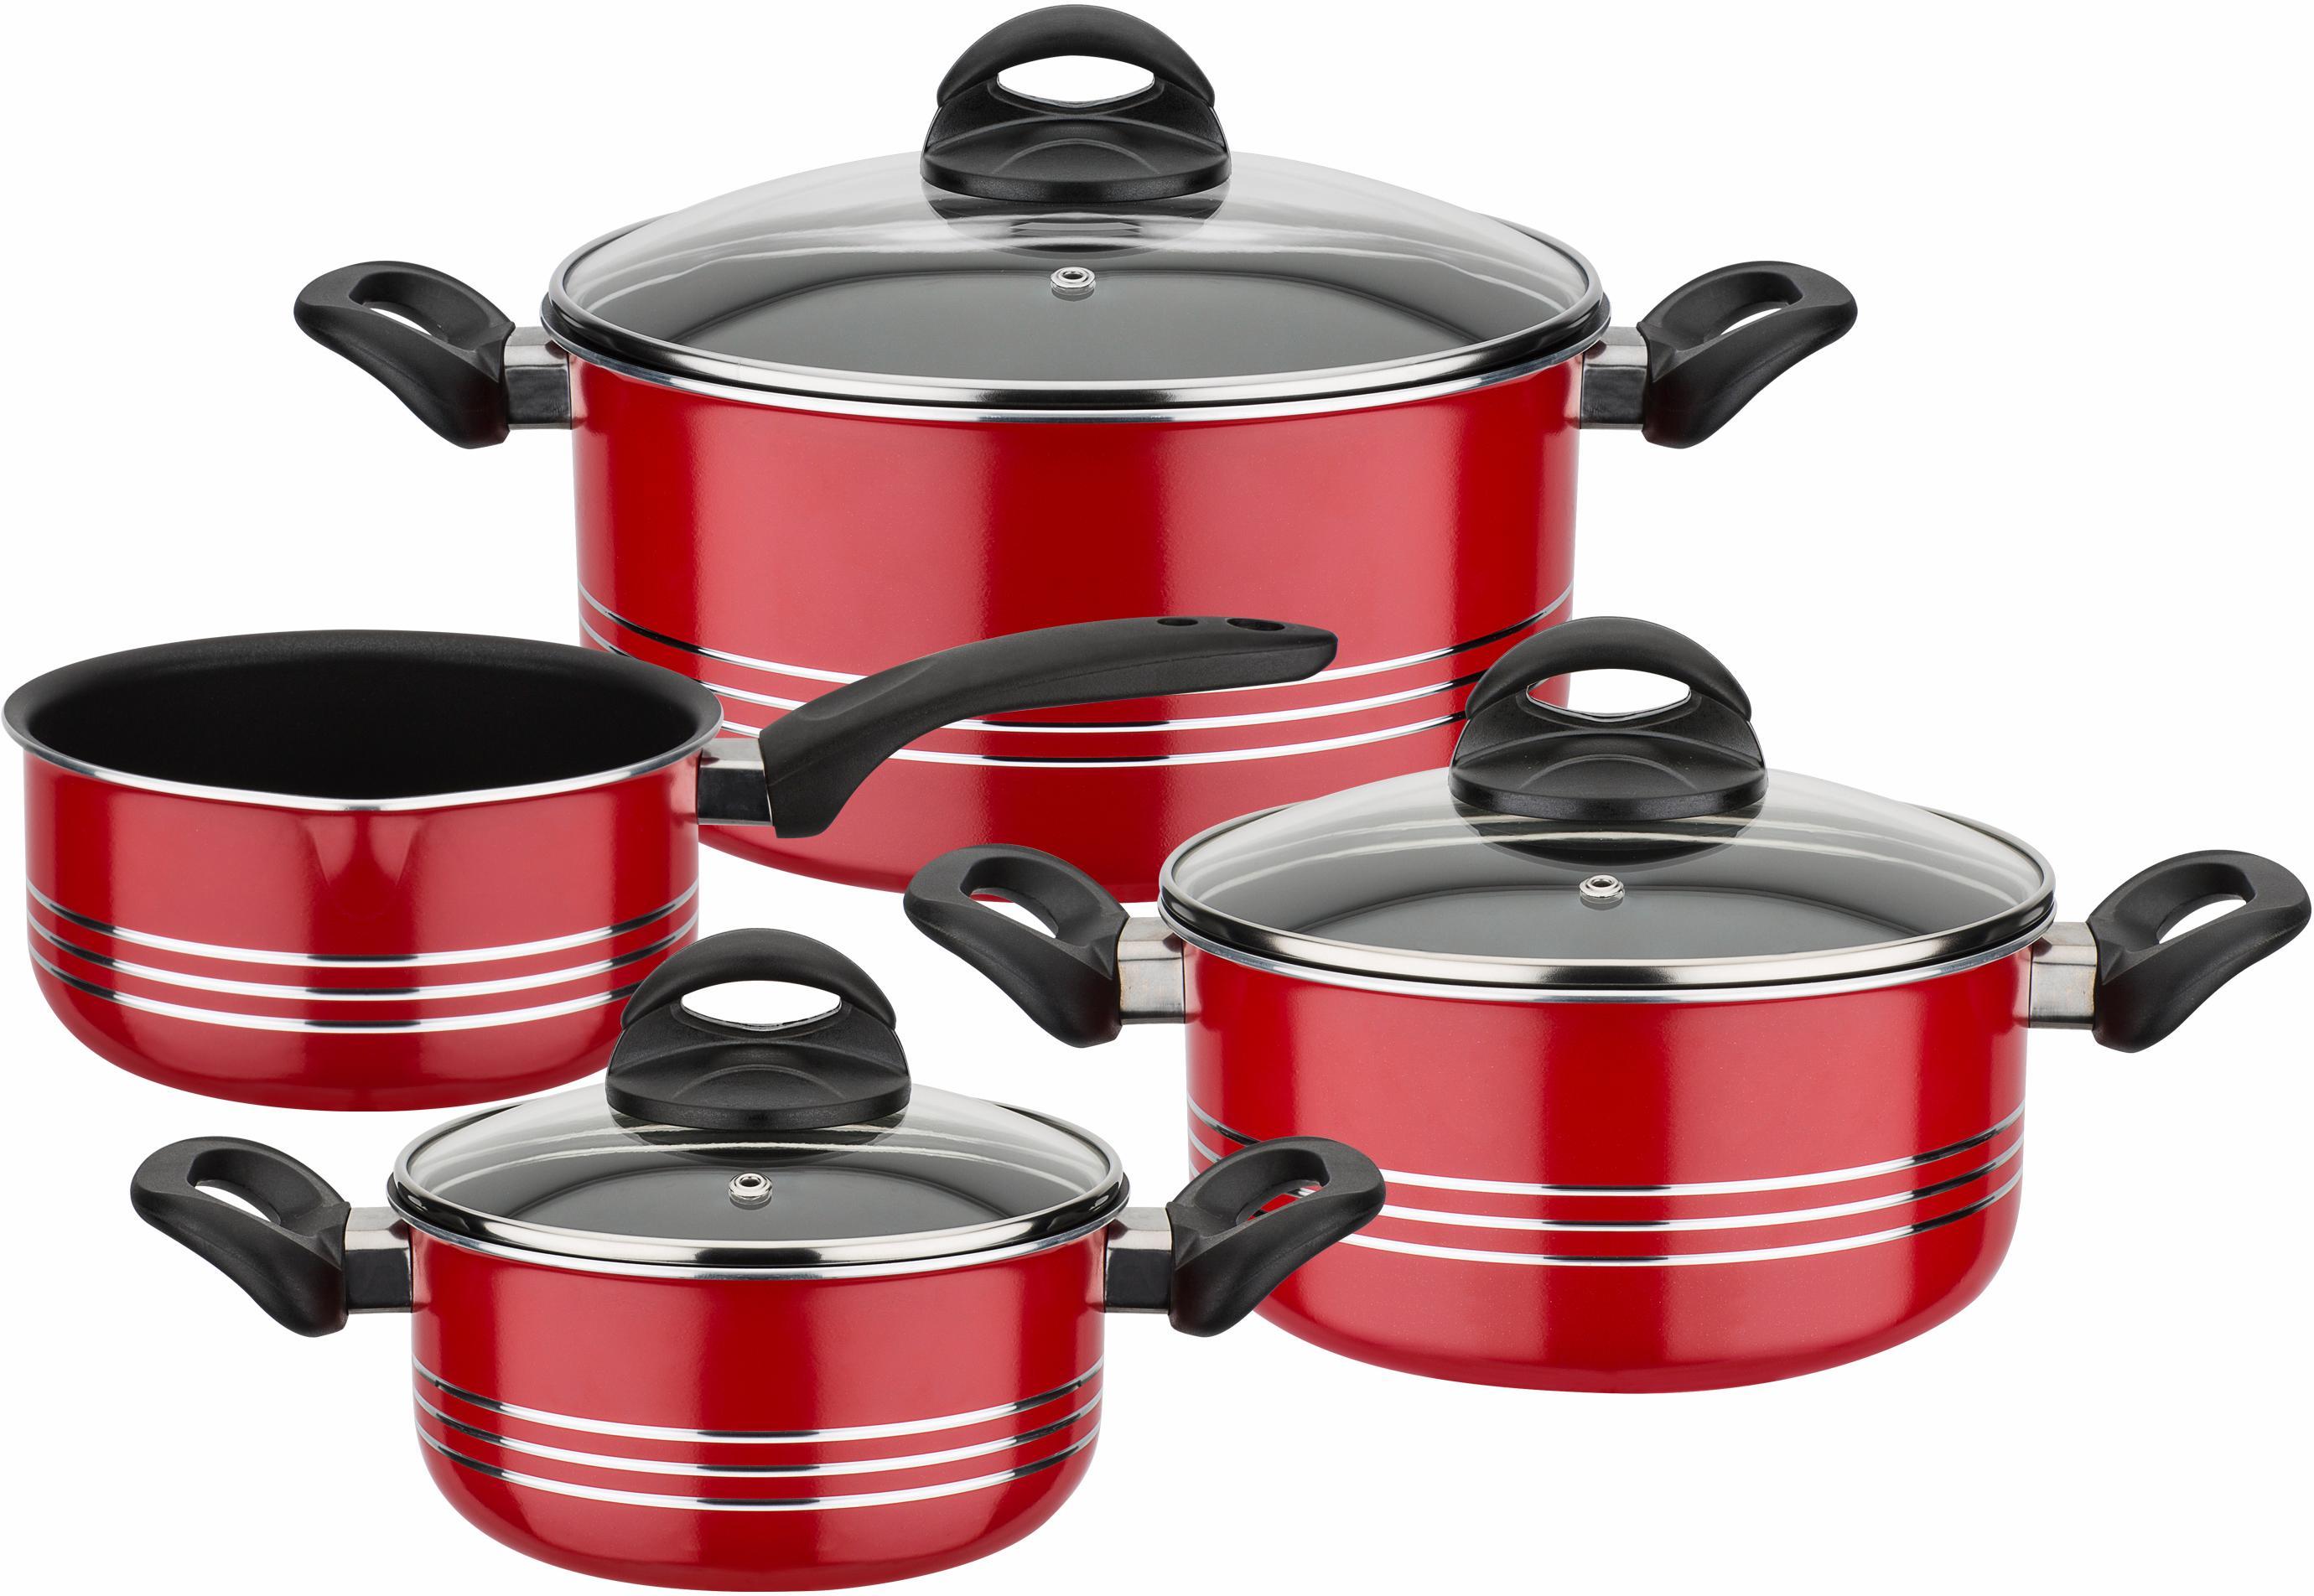 GSW Topf-Set Milano Color, Aluminium-Leichtmetall-Legierung, (Set, 7 tlg.), Induktion rot Topfsets Töpfe Haushaltswaren